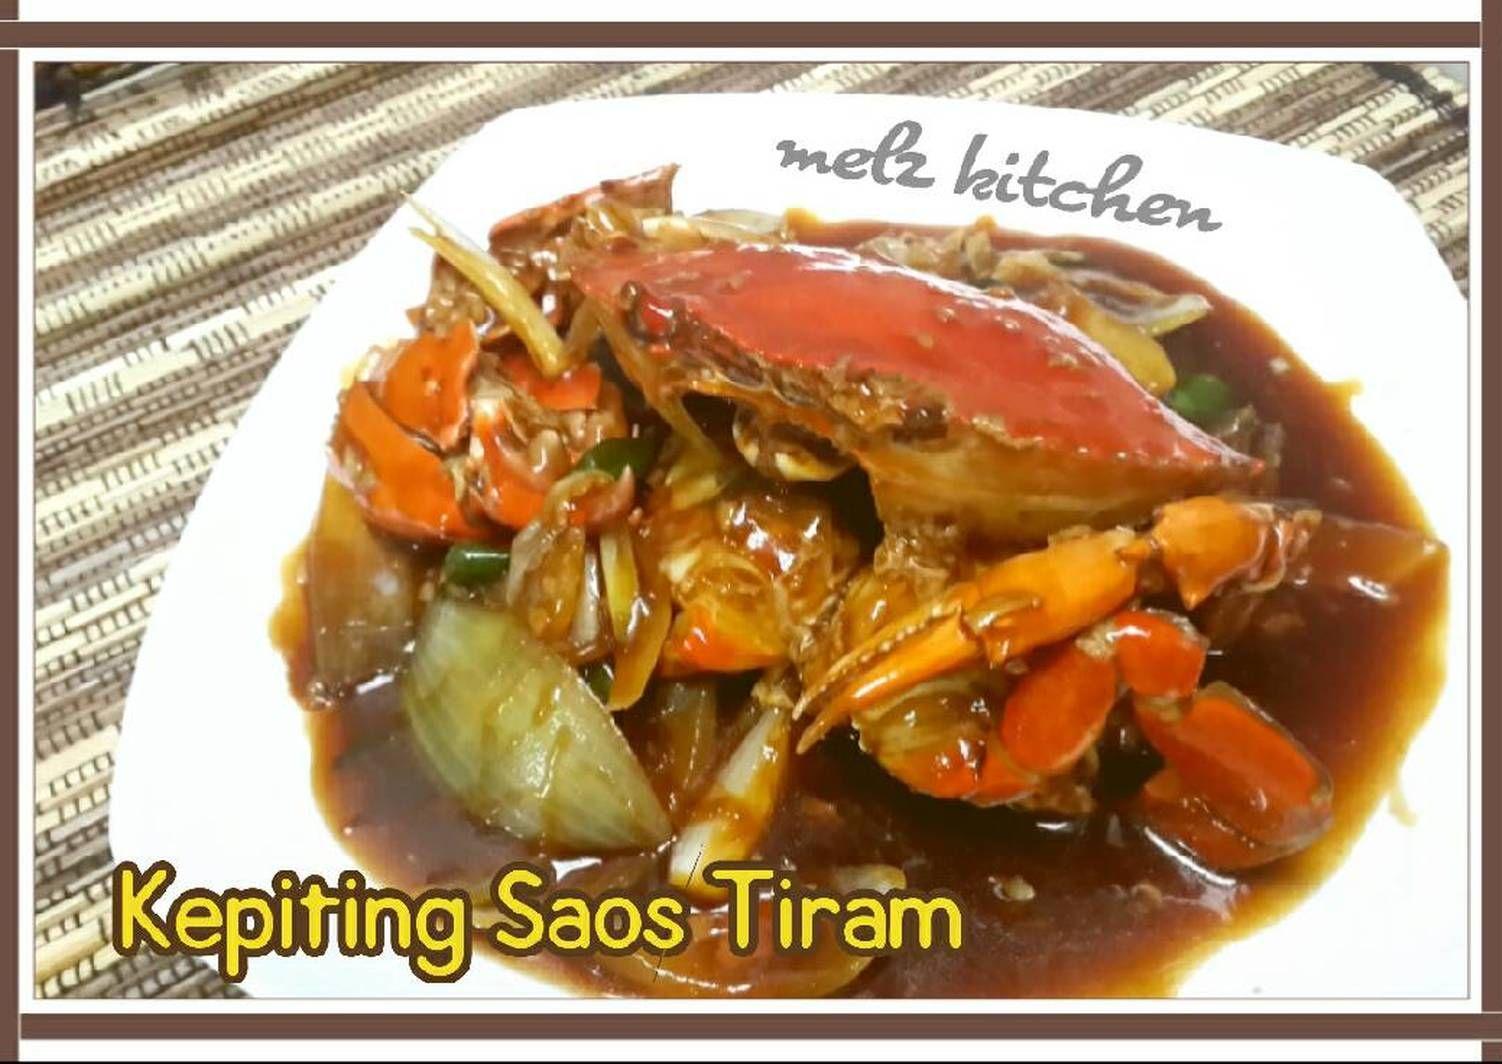 Resep Kepiting Saos Tiram Oleh Melz Kitchen Resep Resep Kepiting Kepiting Resep Masakan